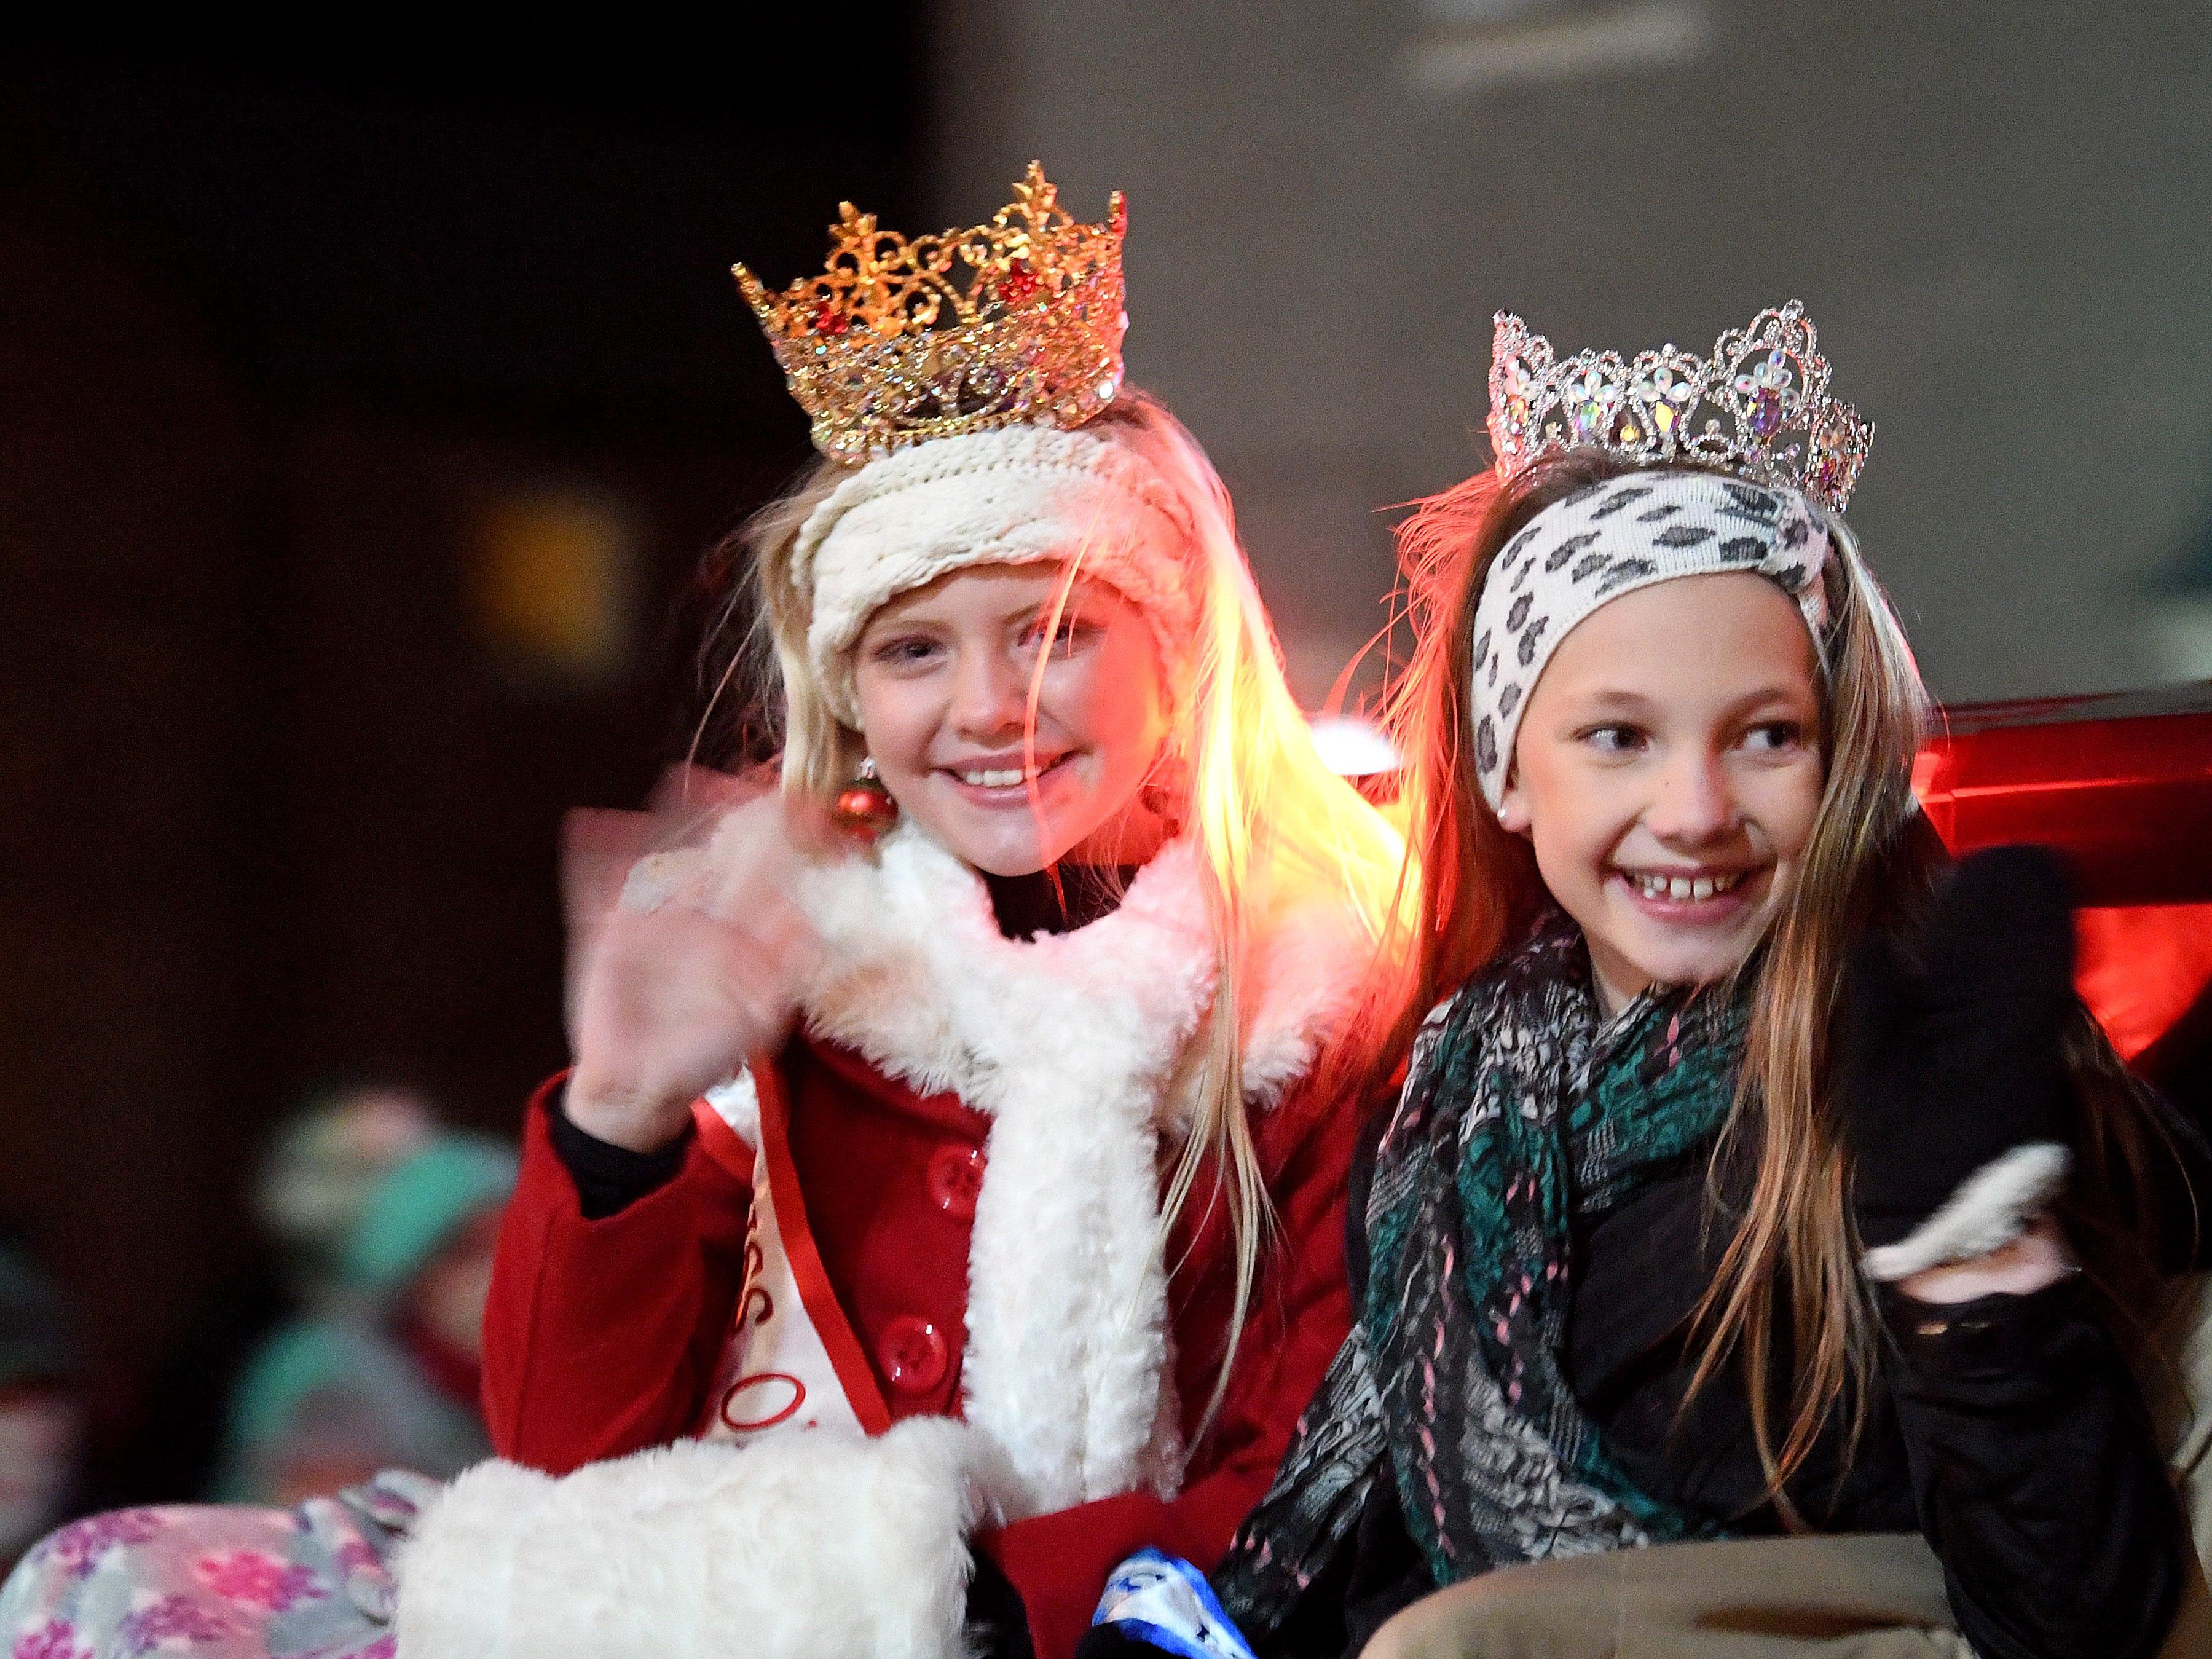 The Staunton Christmas Parade makes its way through downtown on Monday, Nov. 26, 2018.